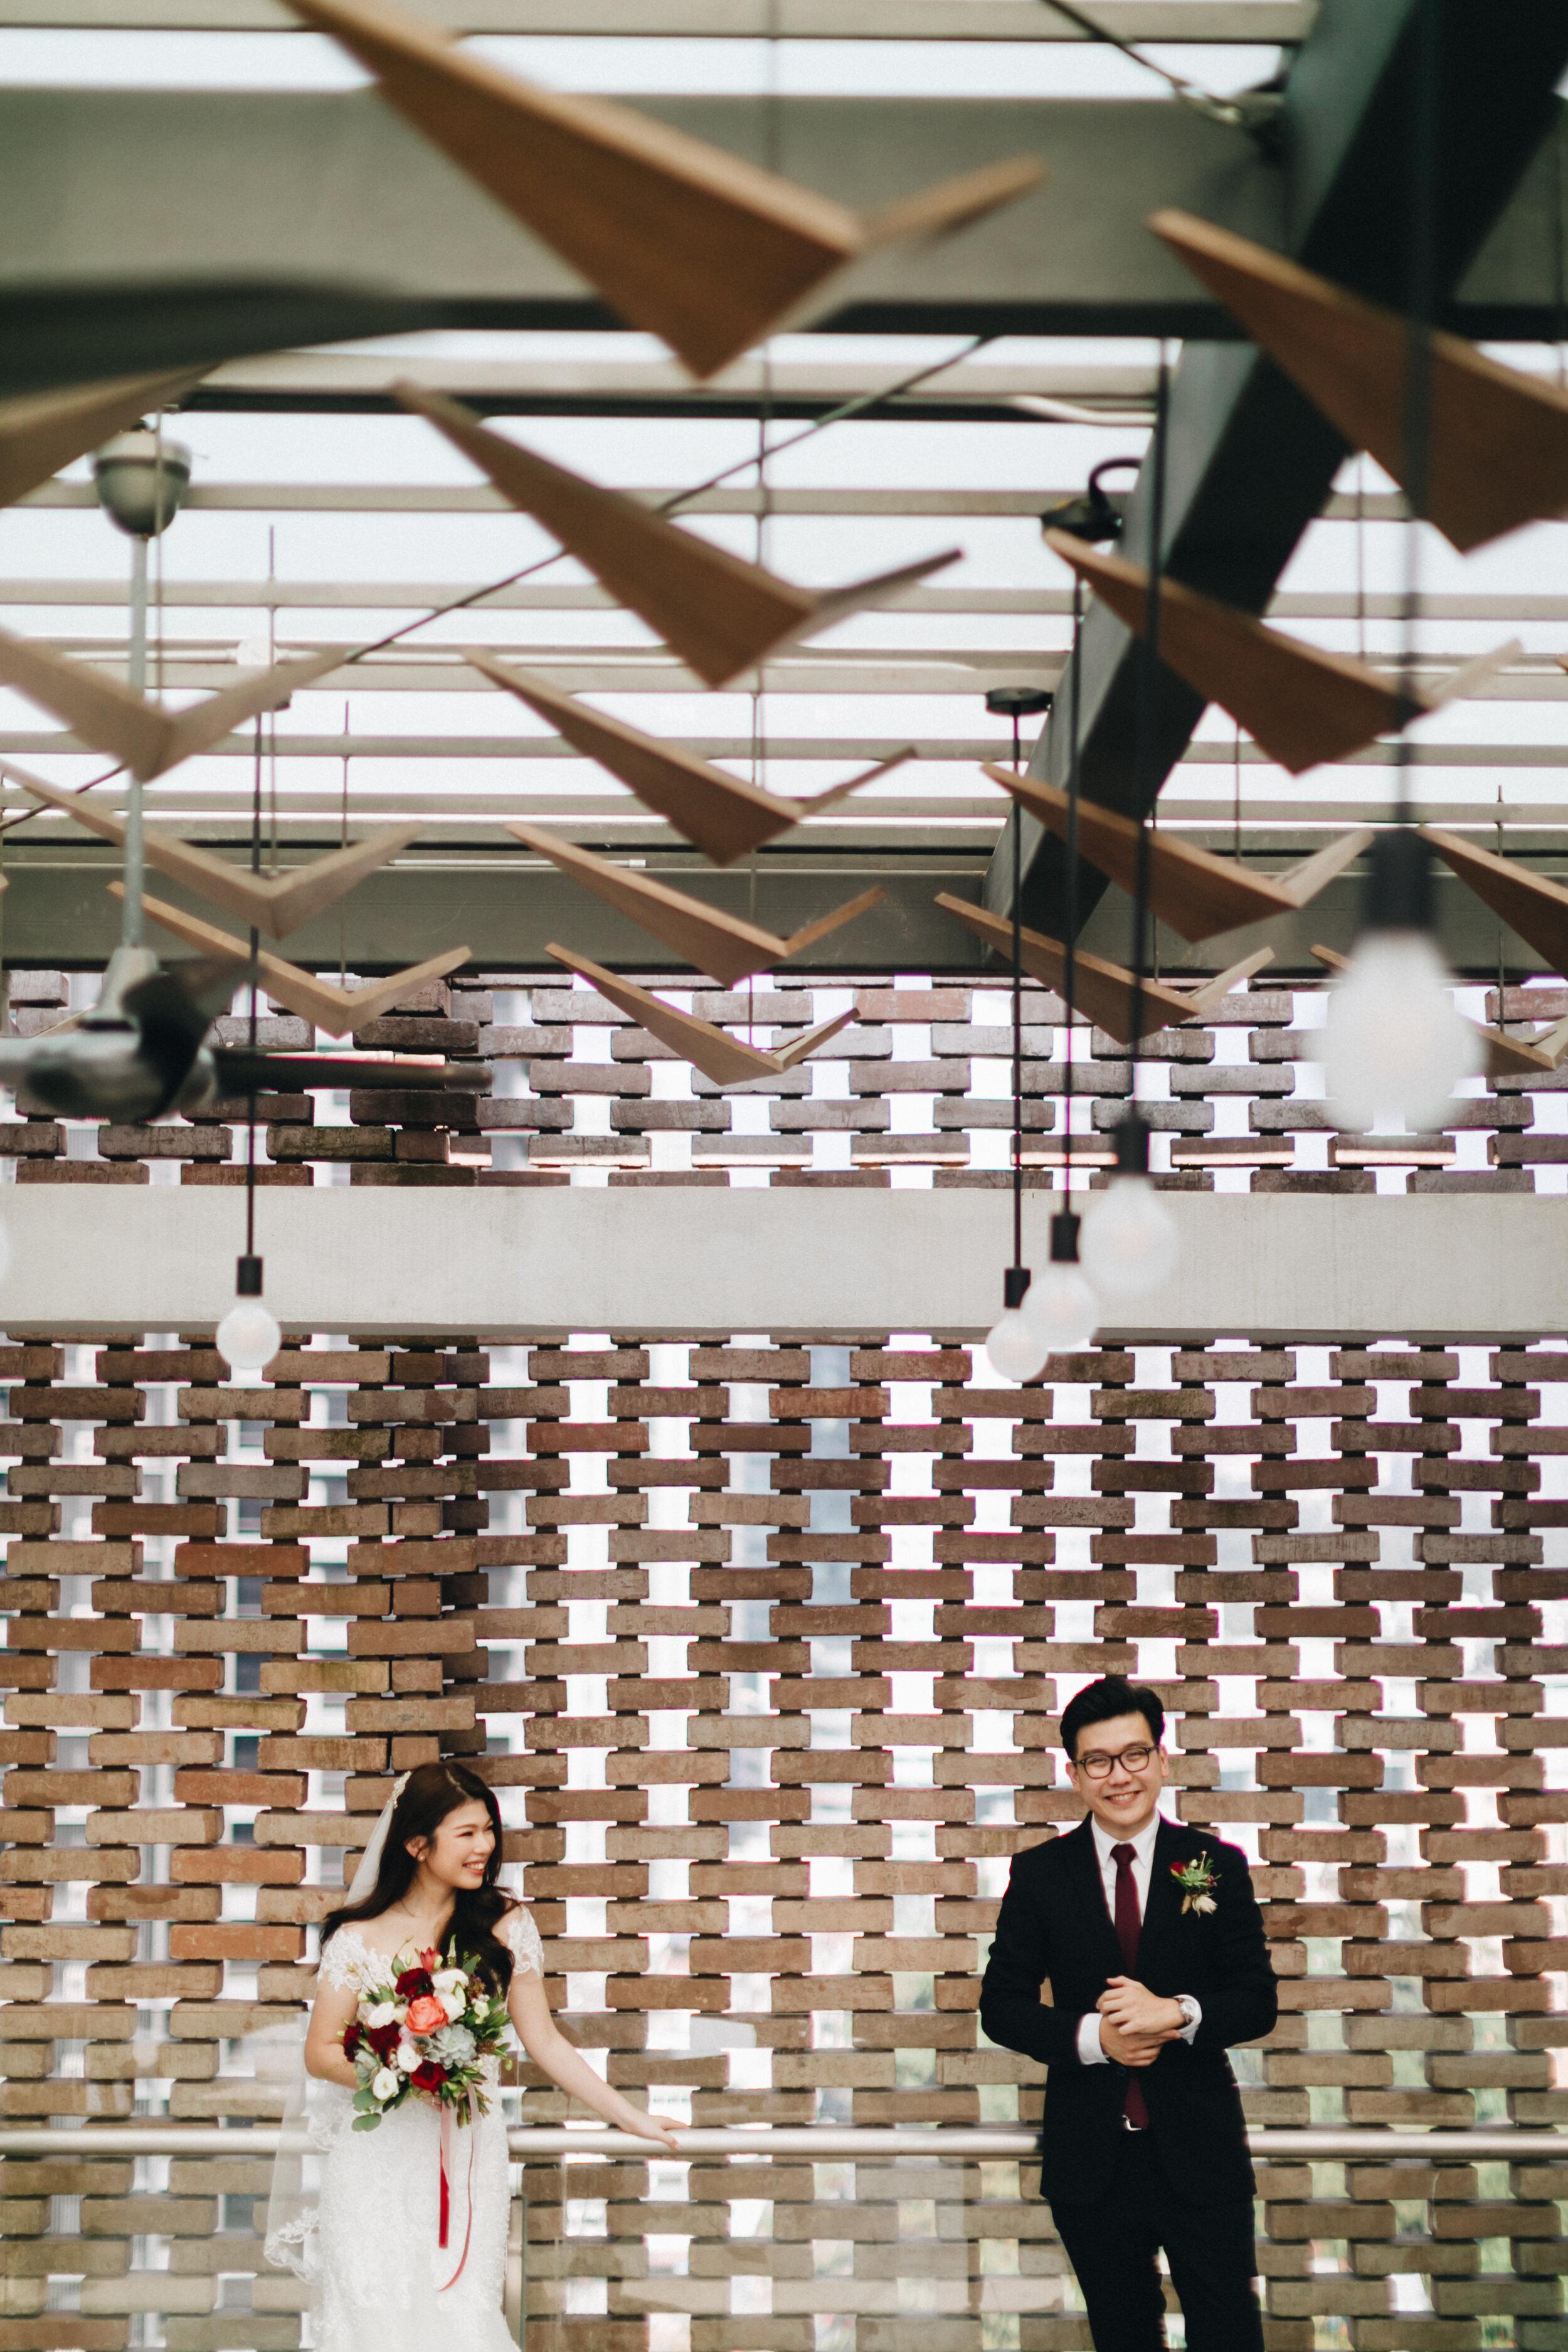 LUCAS & PENNY - Wedding Ceremony at Hotel Strips Kuala Lumpur